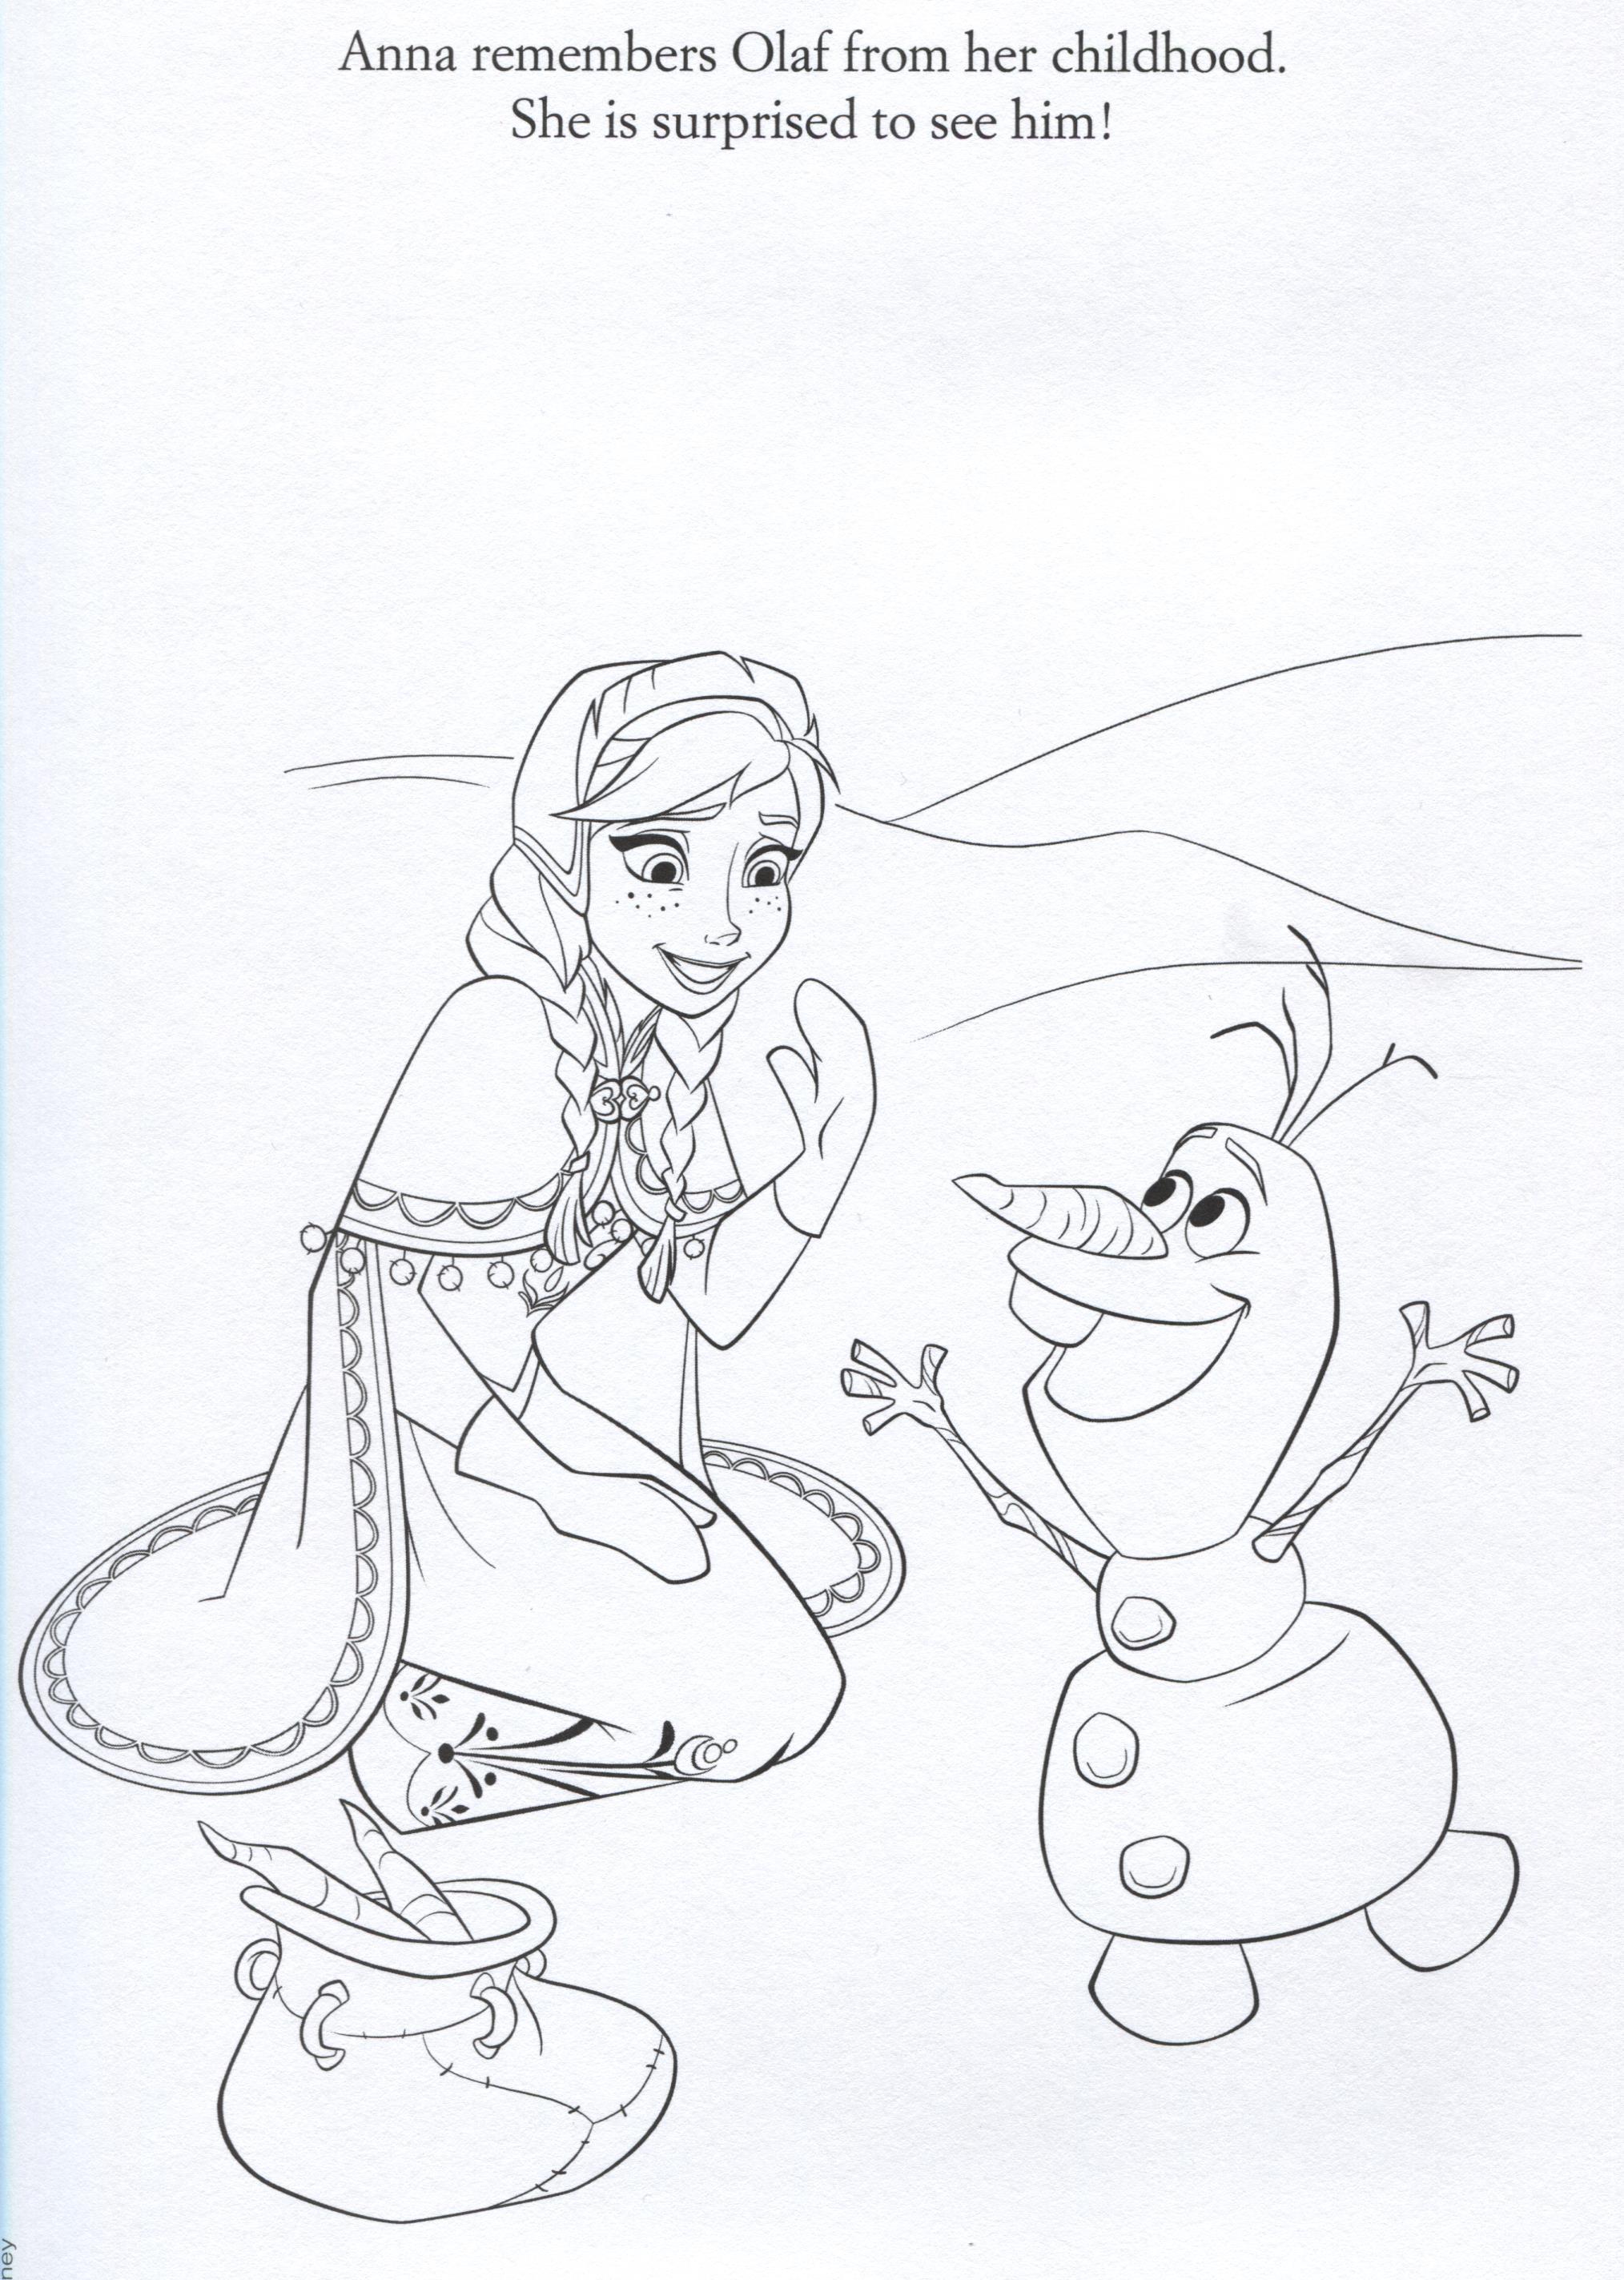 Official Frozen Illustrations Coloring Pages Frozen Foto